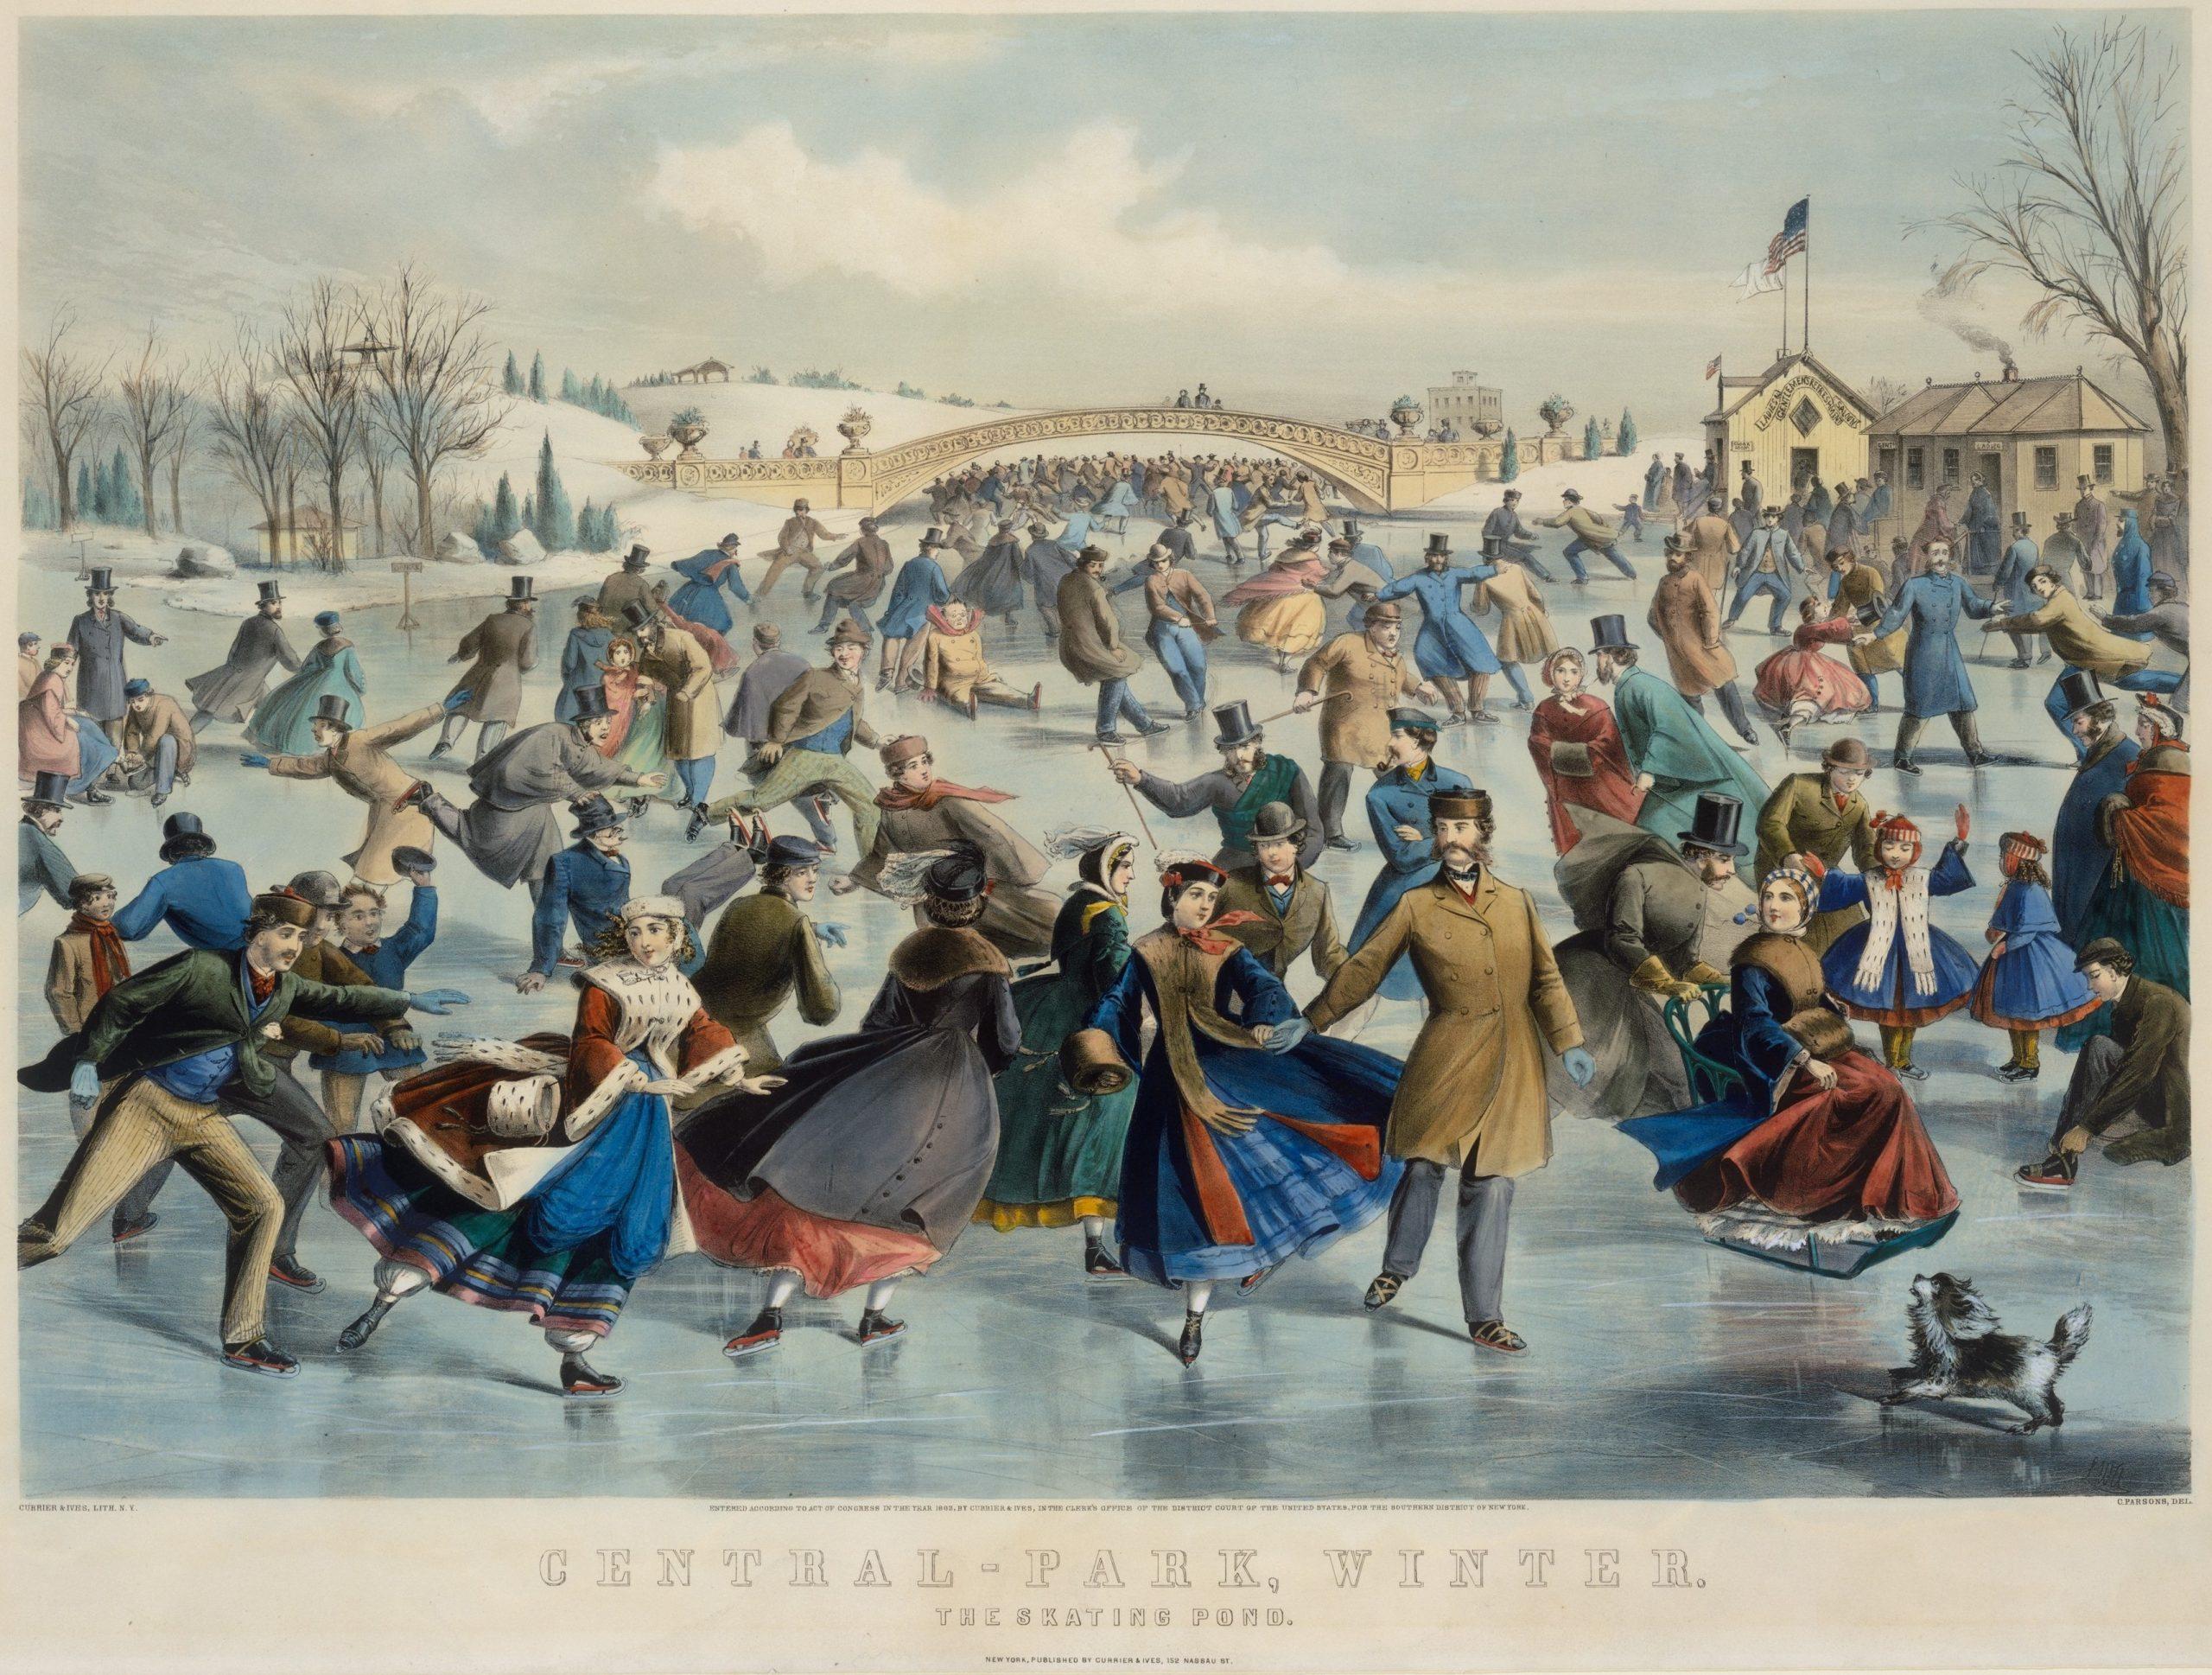 Currier & Ives, Charles Parsons, Central Park, Winter, Skating Pond